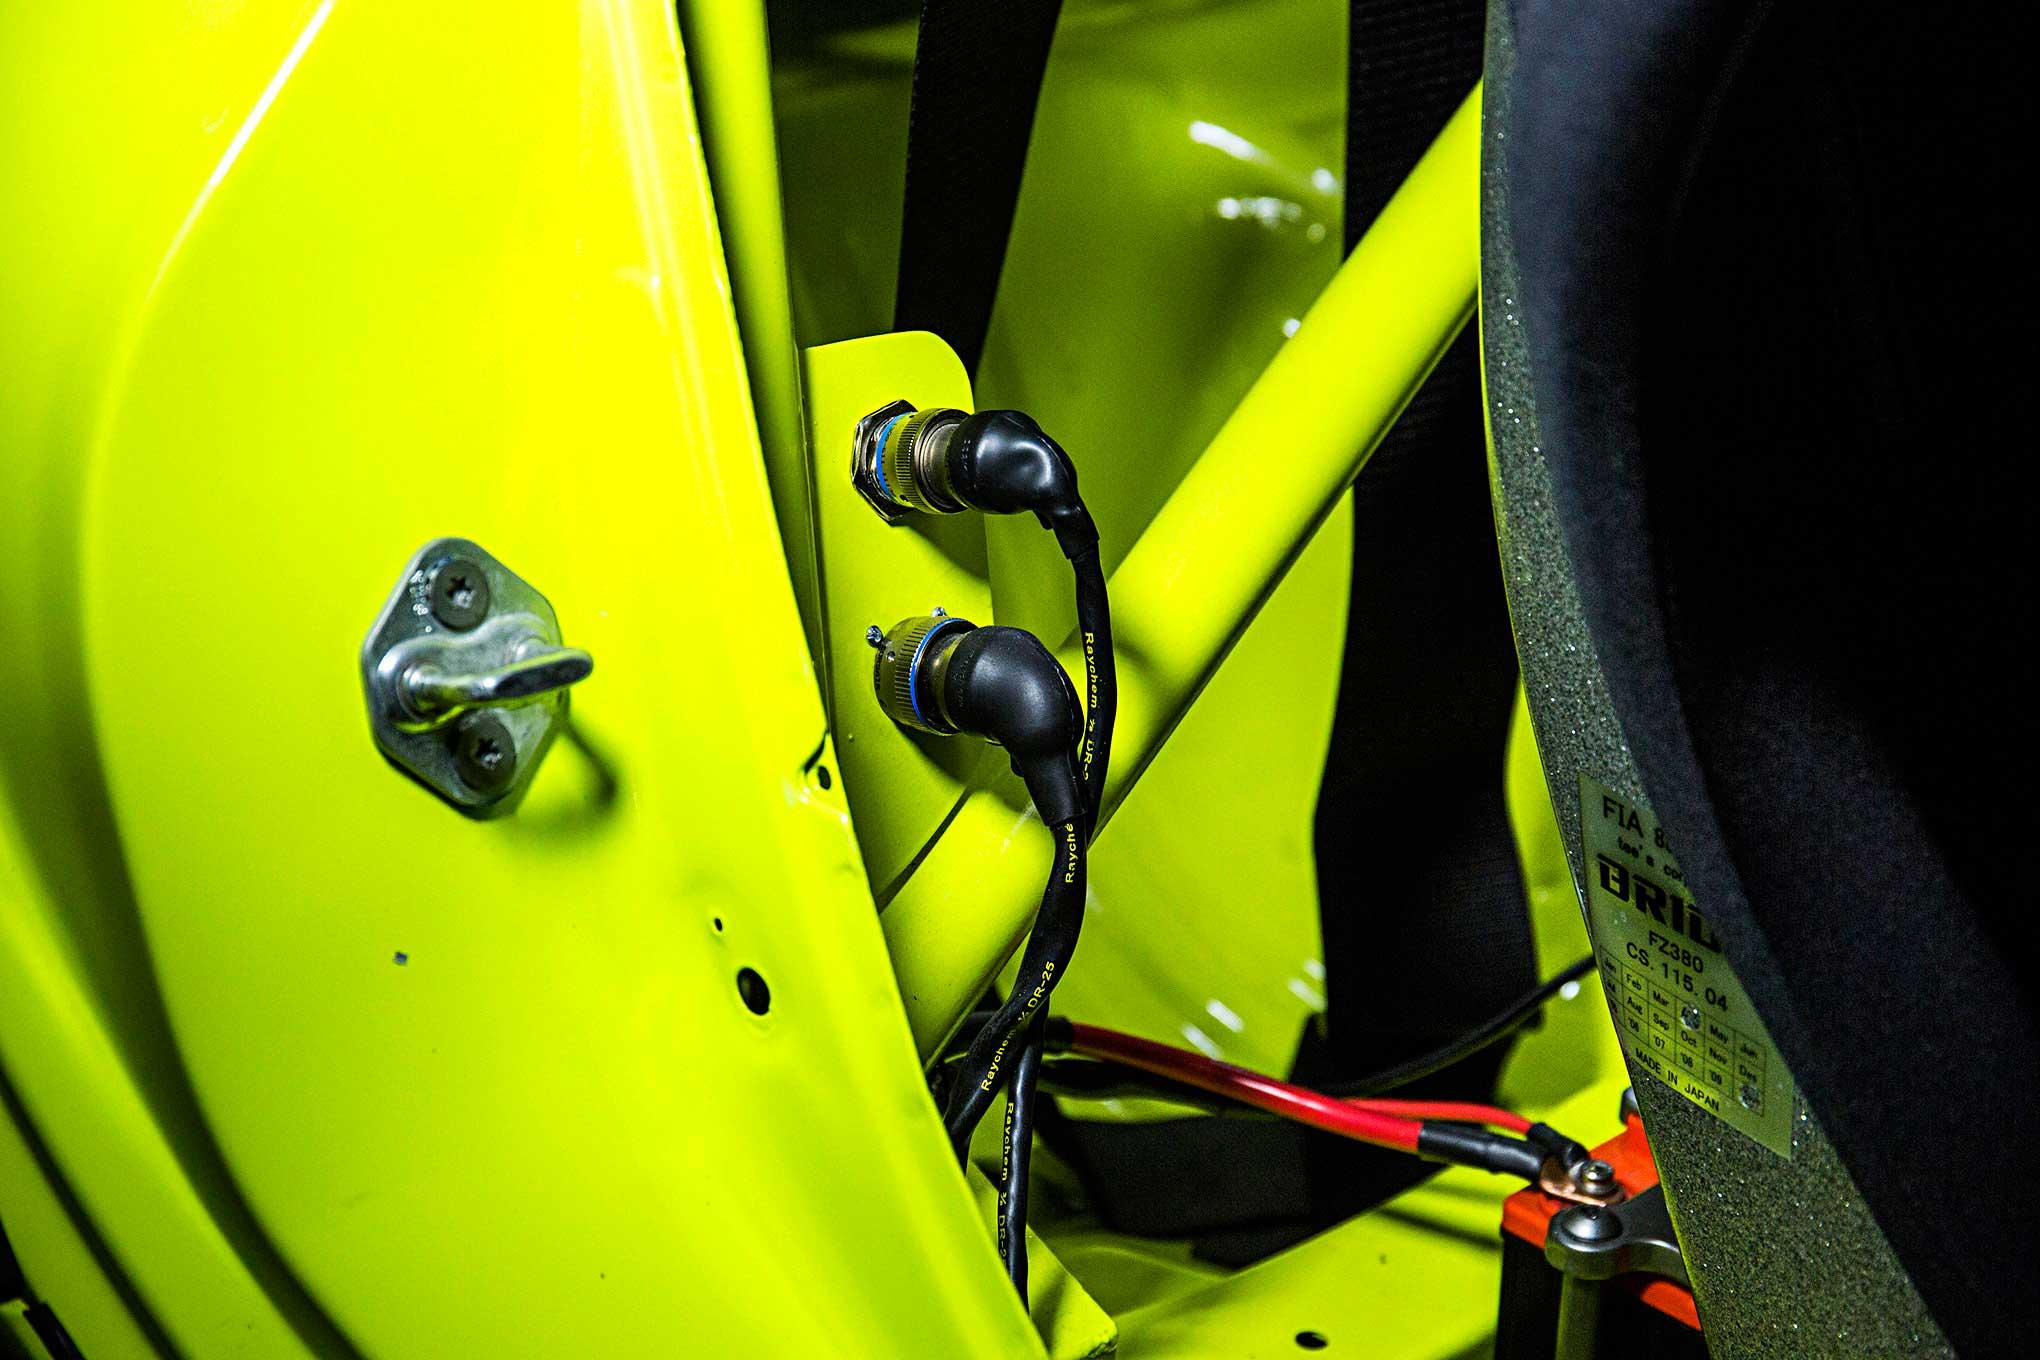 medium resolution of 1993 mazda rx 7 shine bright1993 mazda rx 7 custom rywire wiring harness